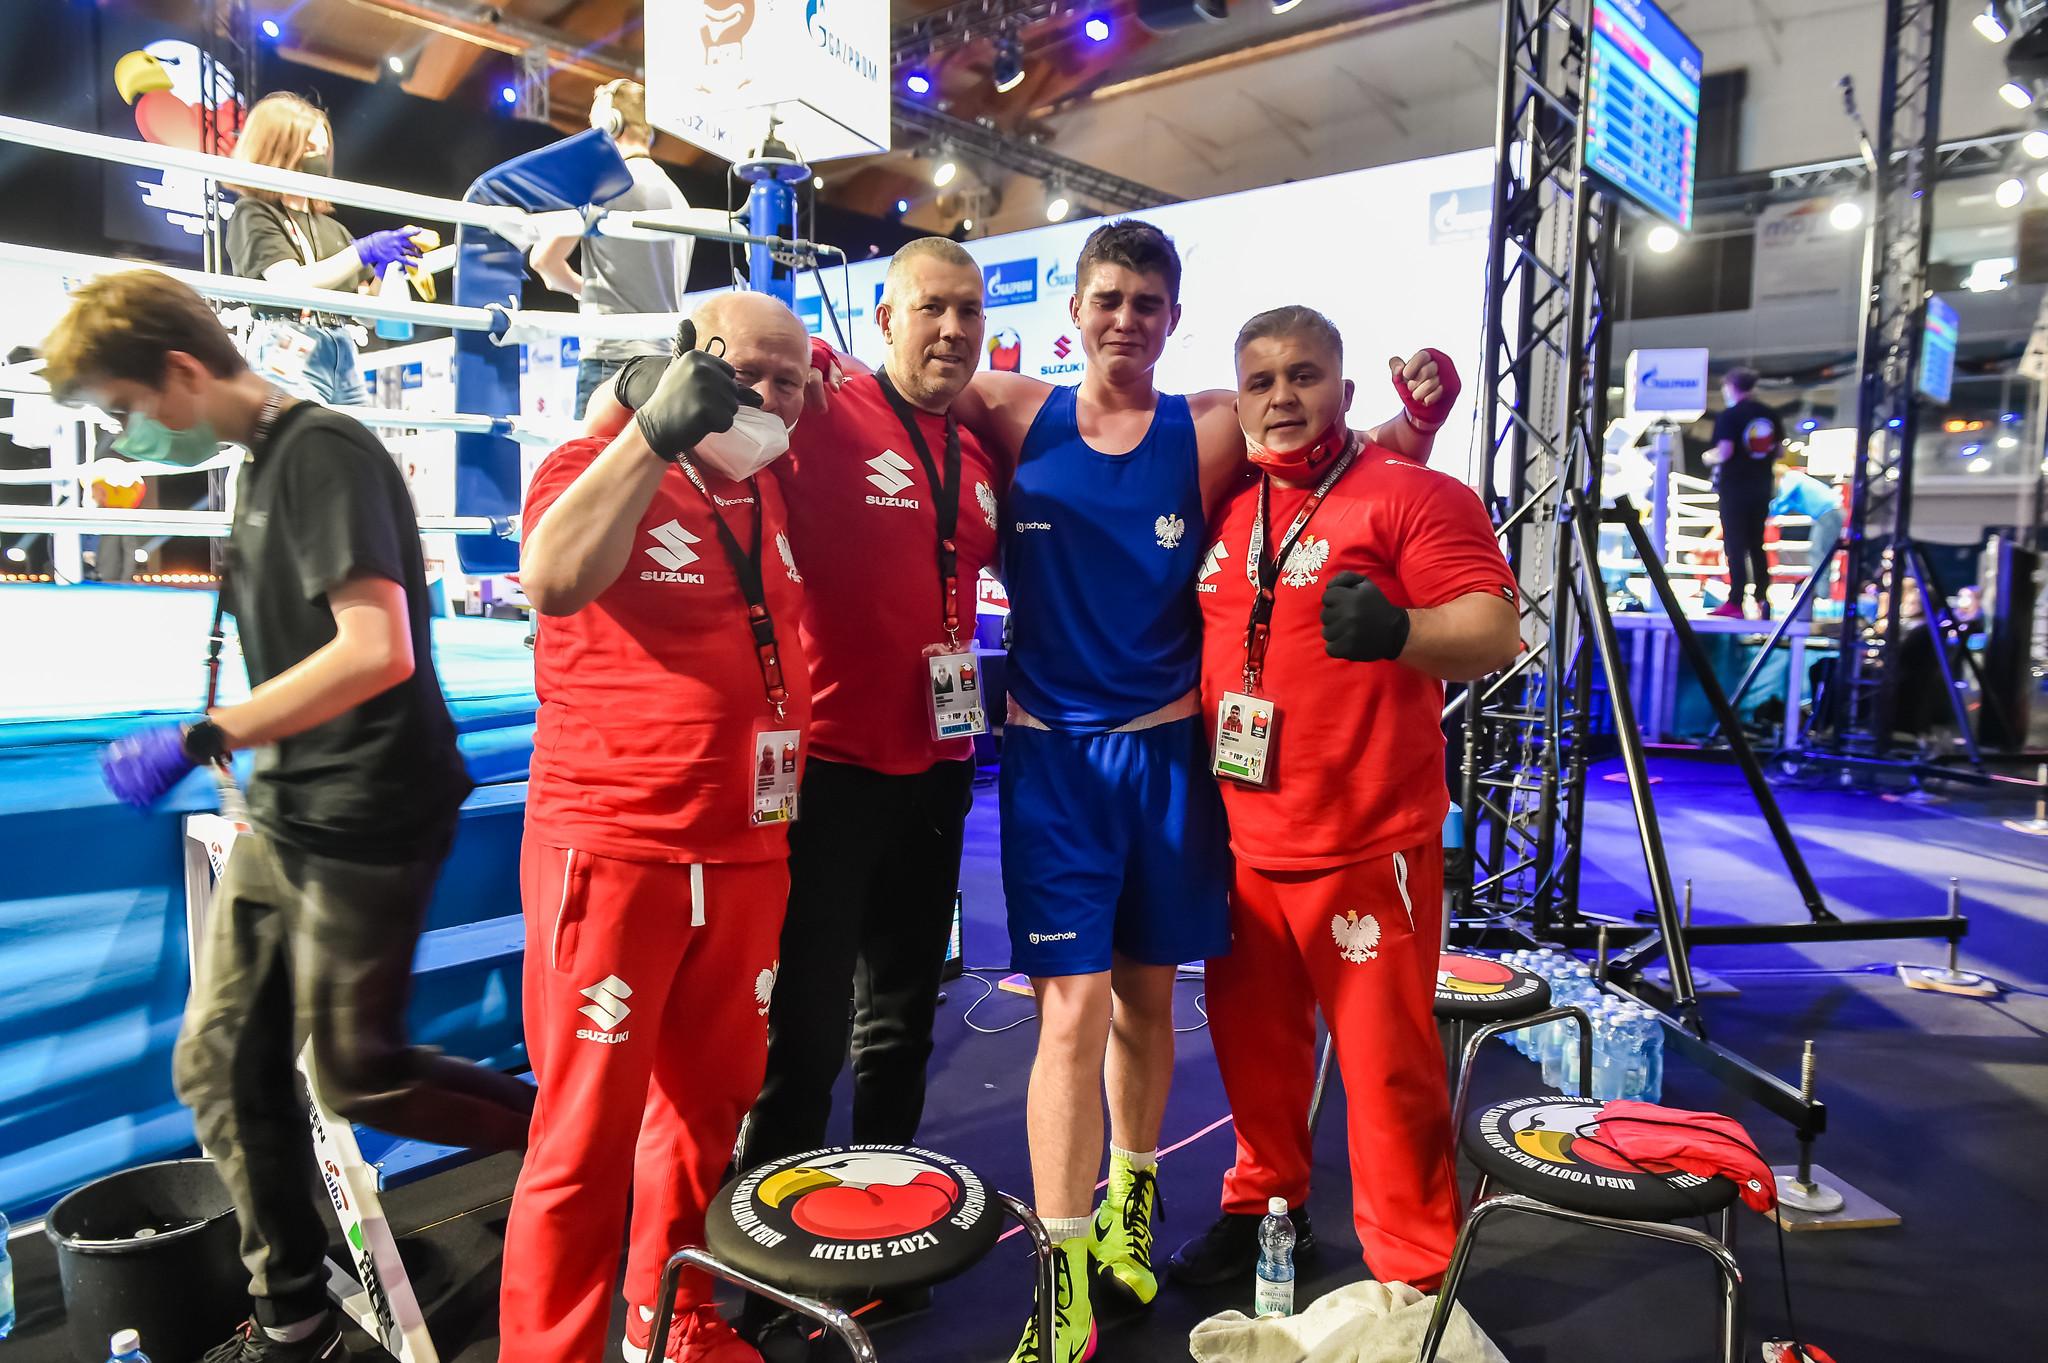 Gupta instead faces home fighter Jakub Straszewski, in blue, next, with Straszewski emotial after securing a medal ©AIBA